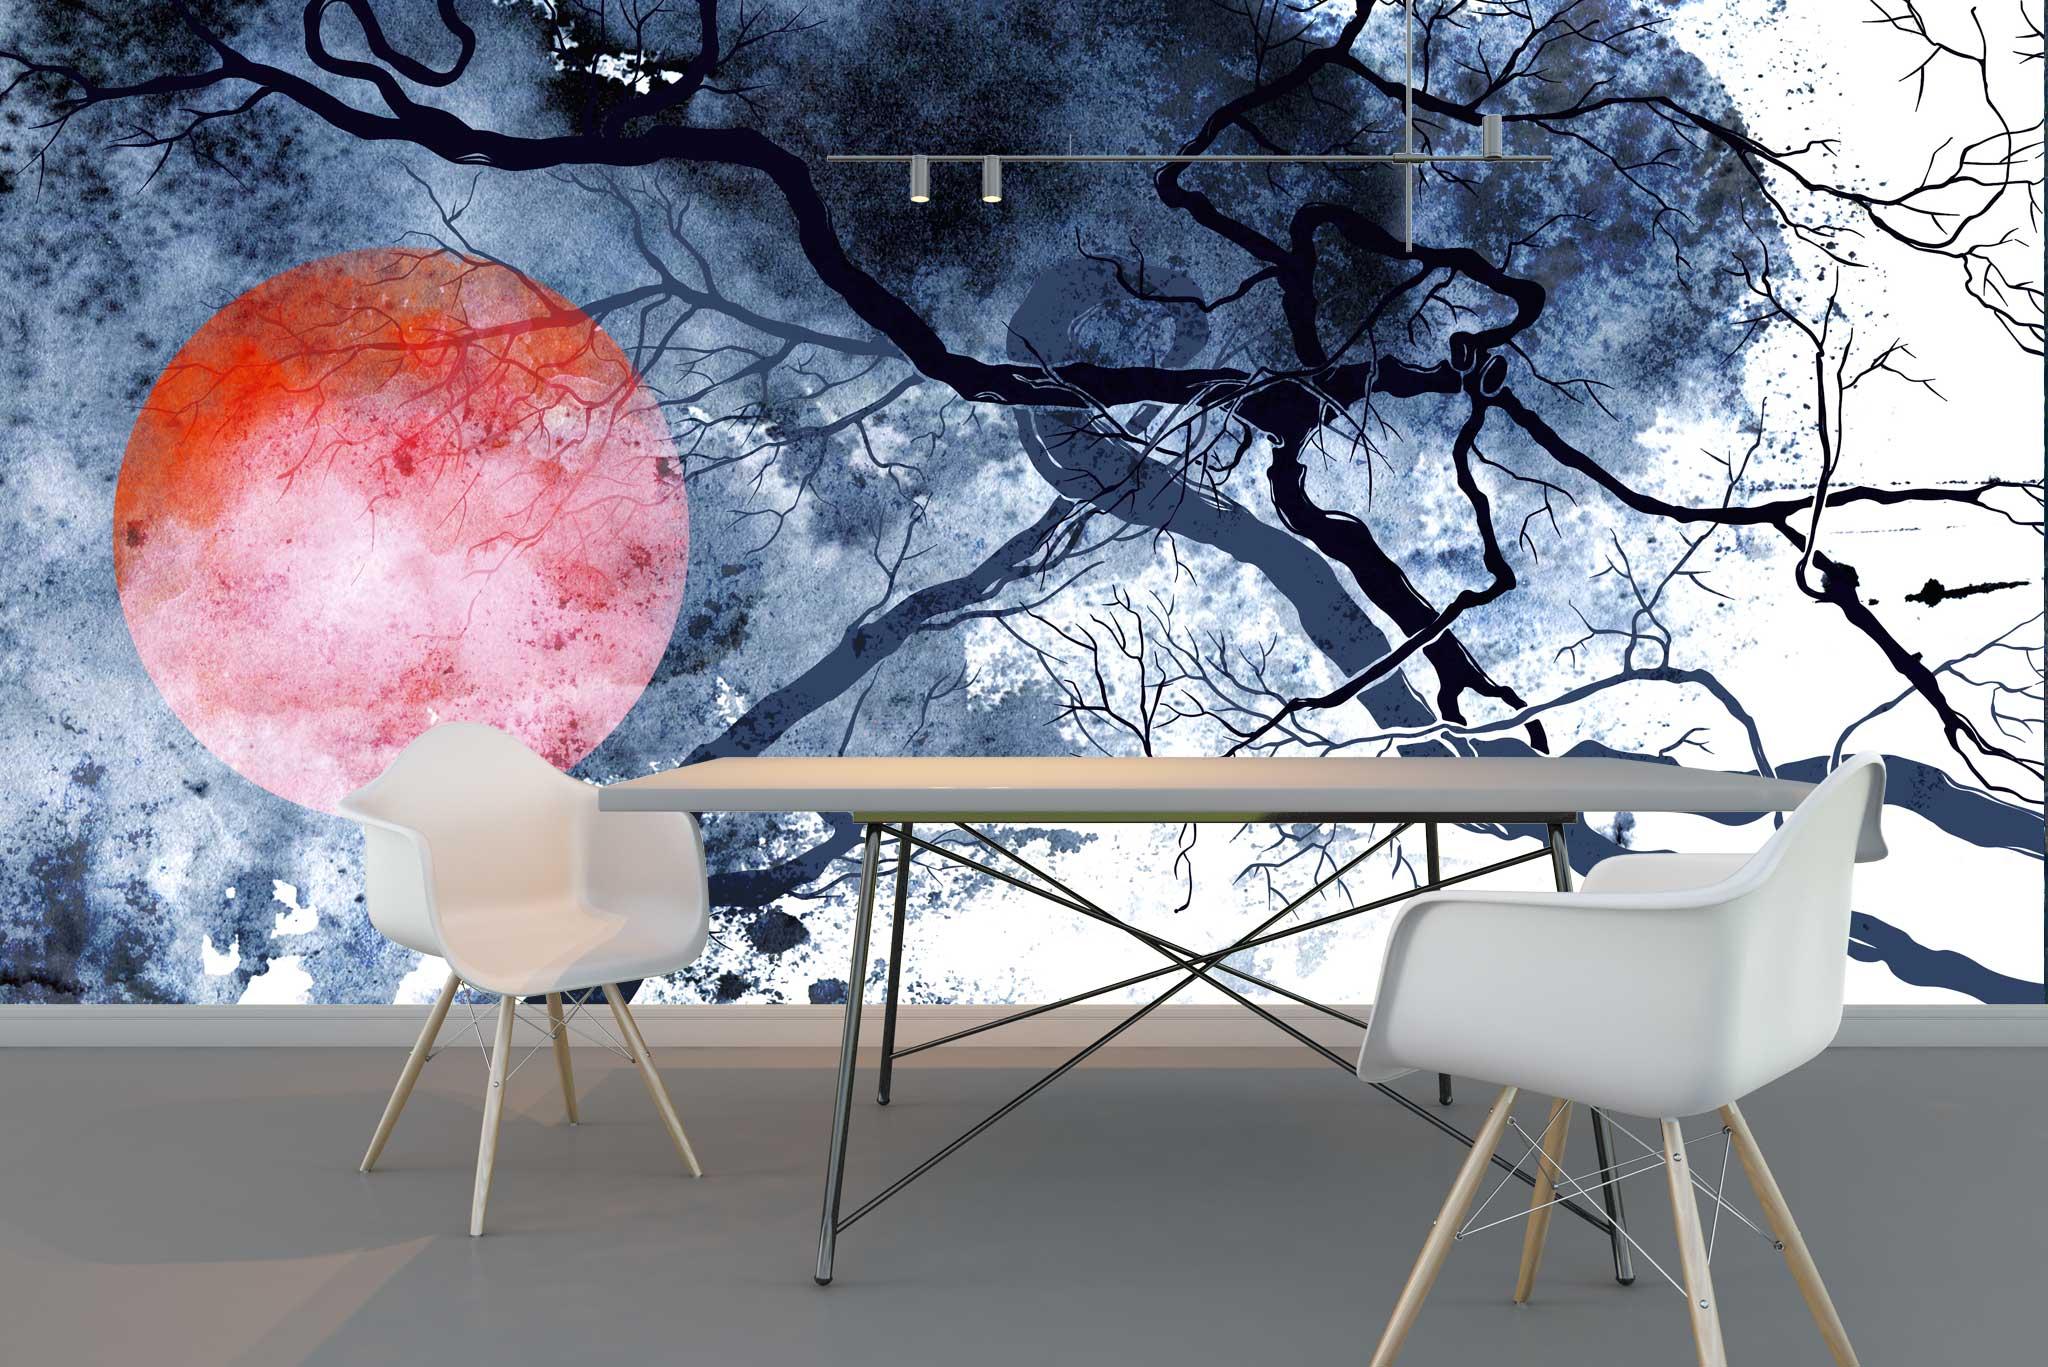 tapet-fototapet-comanda-personalizat-bucuresti-perete-special-lux-model-pictura-desen-stil-asiatic-crengi-soare-japonez